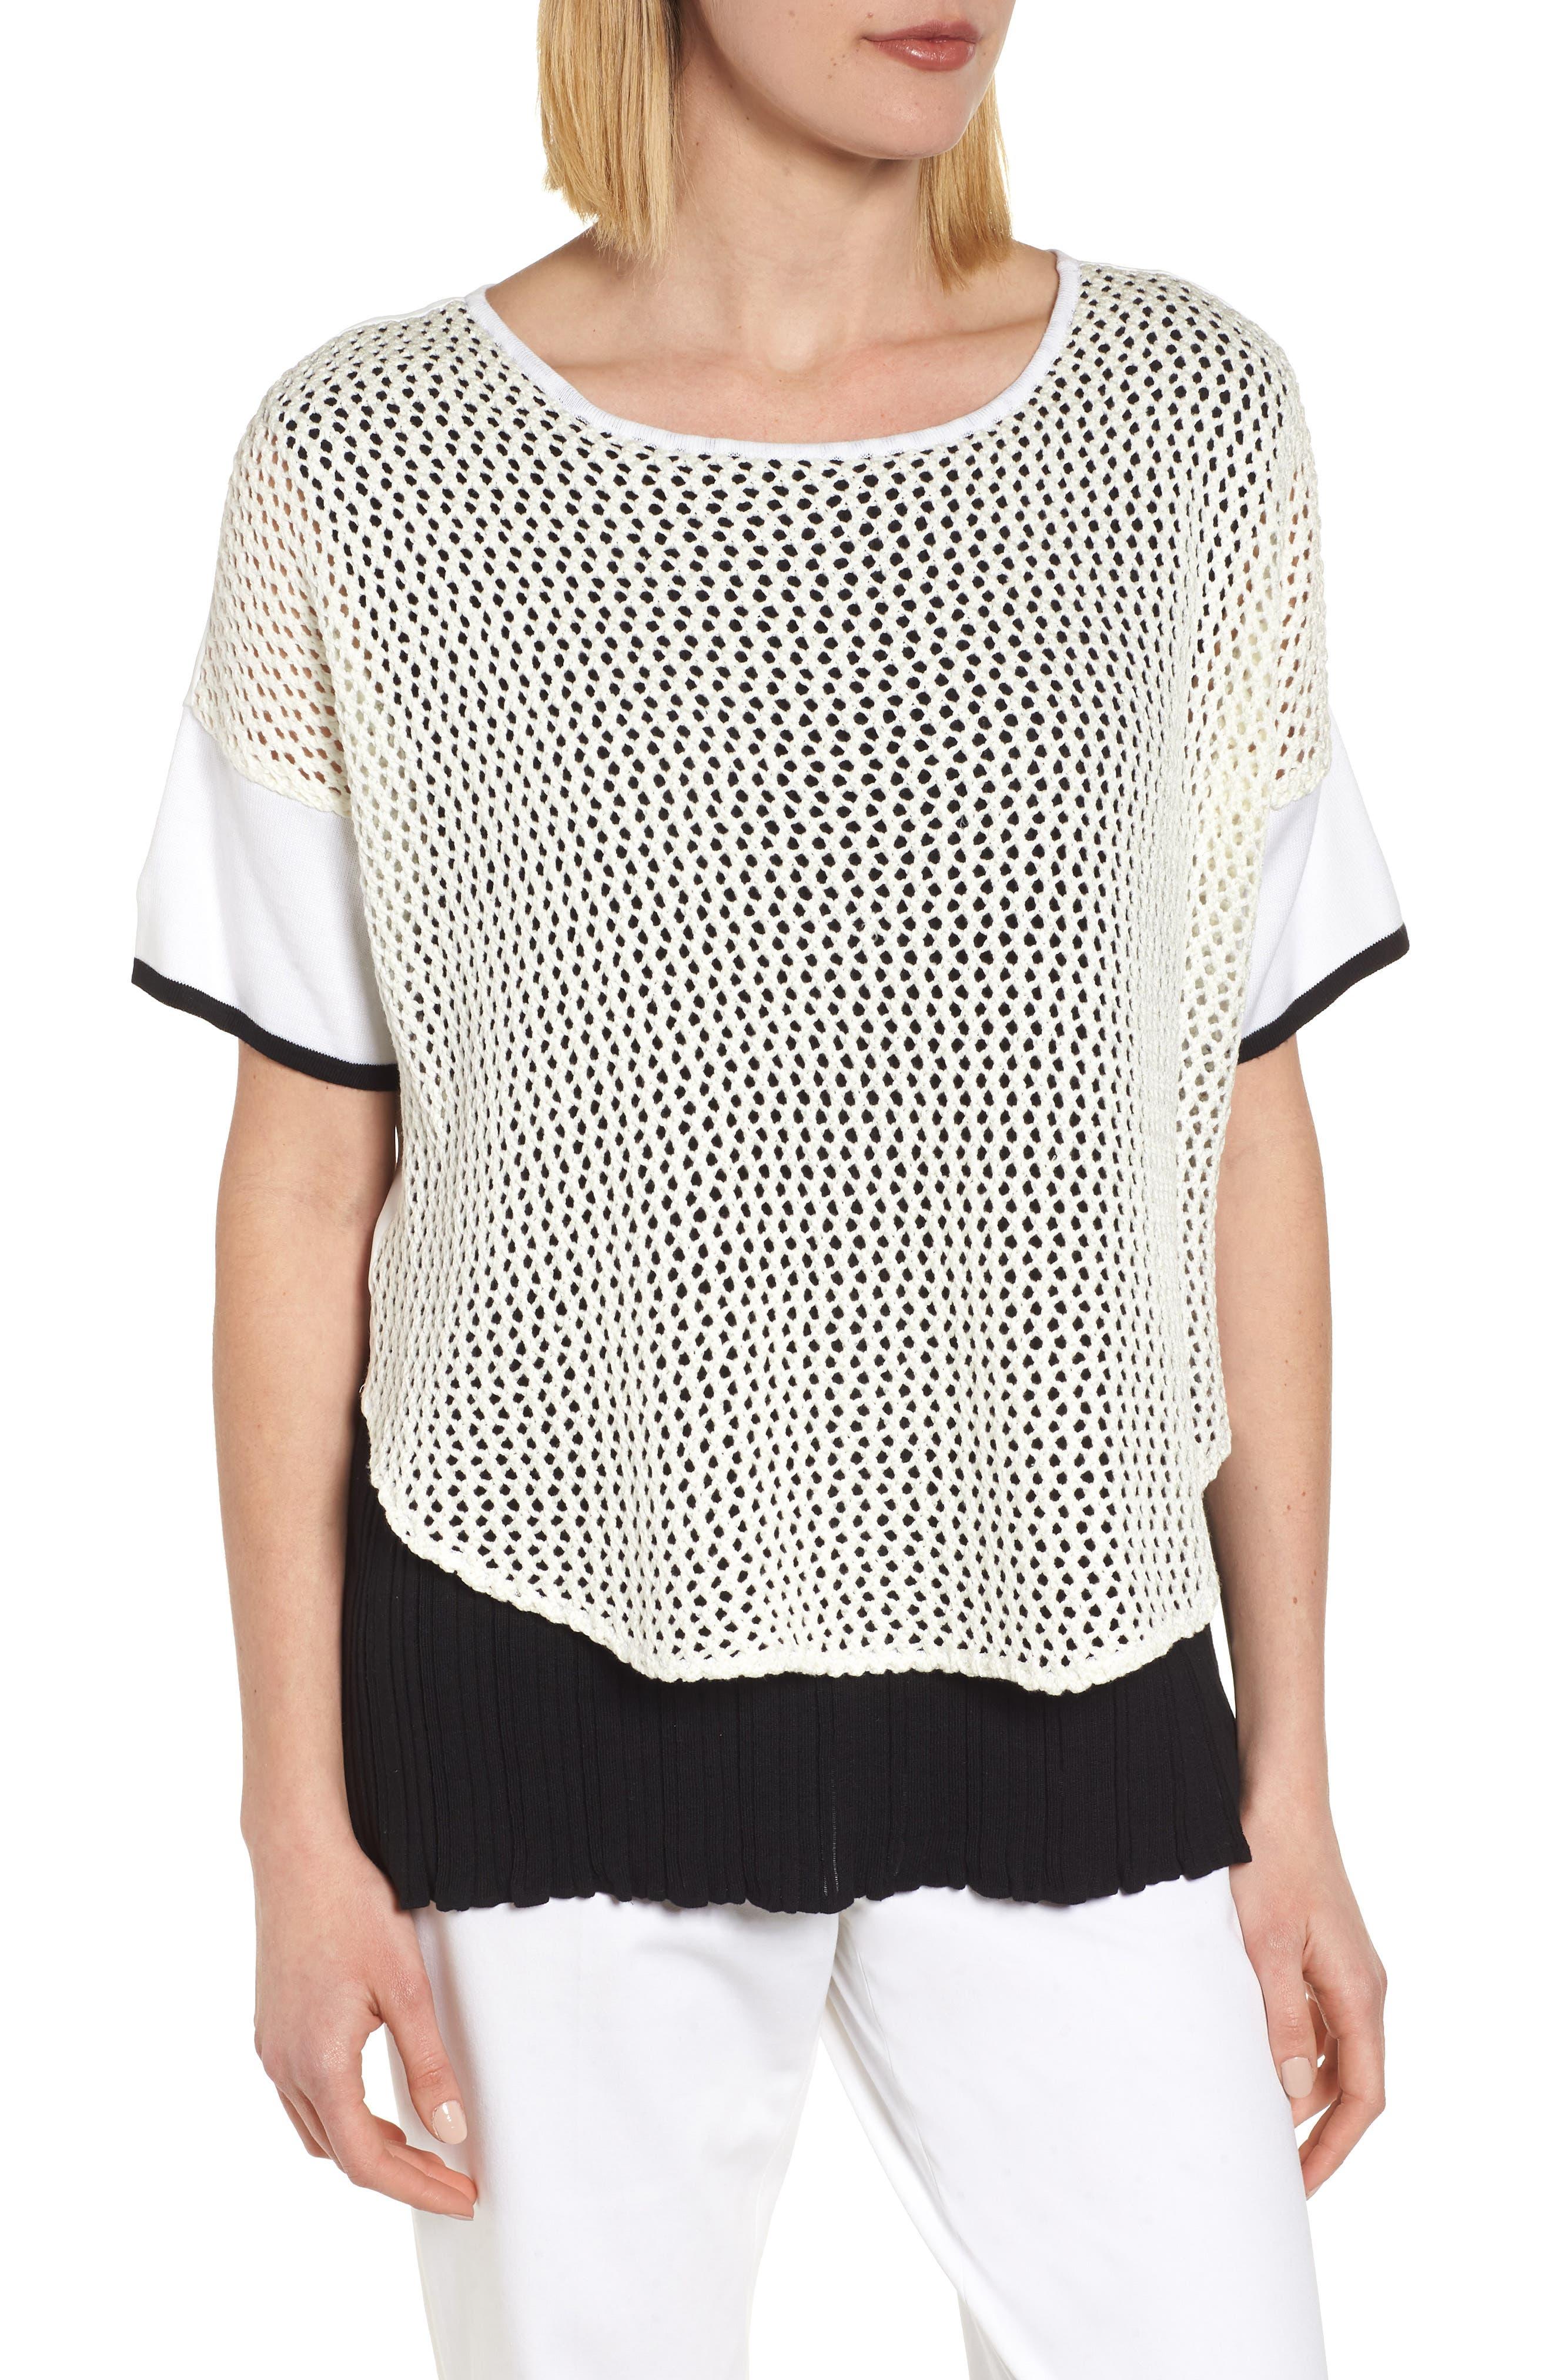 Mixed Media Short Sleeve Tunic Top,                             Main thumbnail 1, color,                             WHITE/ BLACK